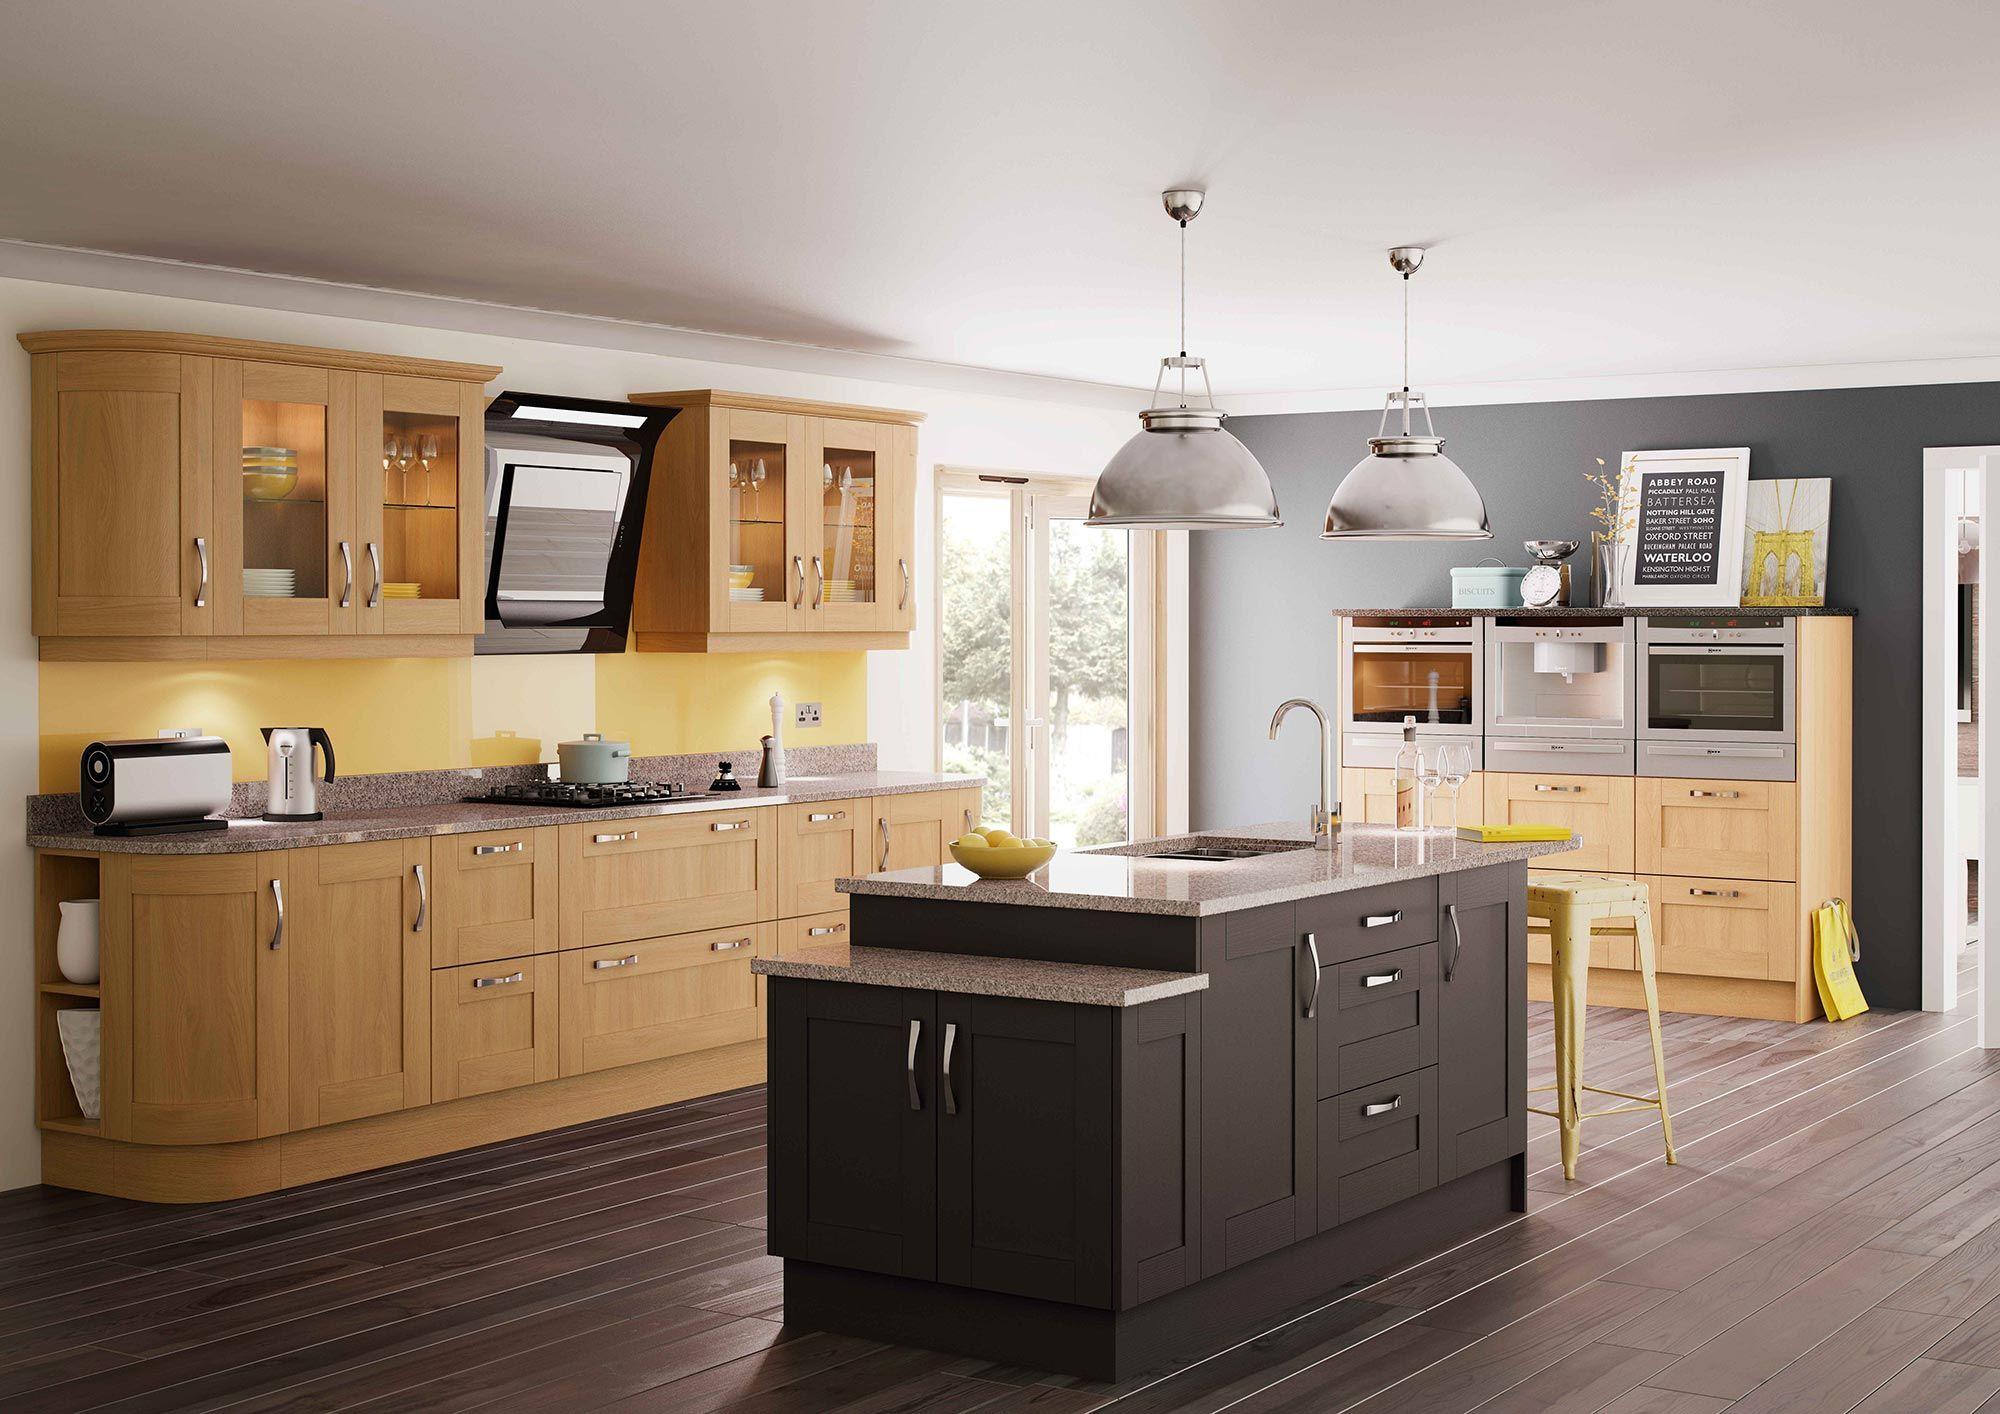 Trenton oak & graphite http://www.sigma3.co.uk/kitchens/style ...